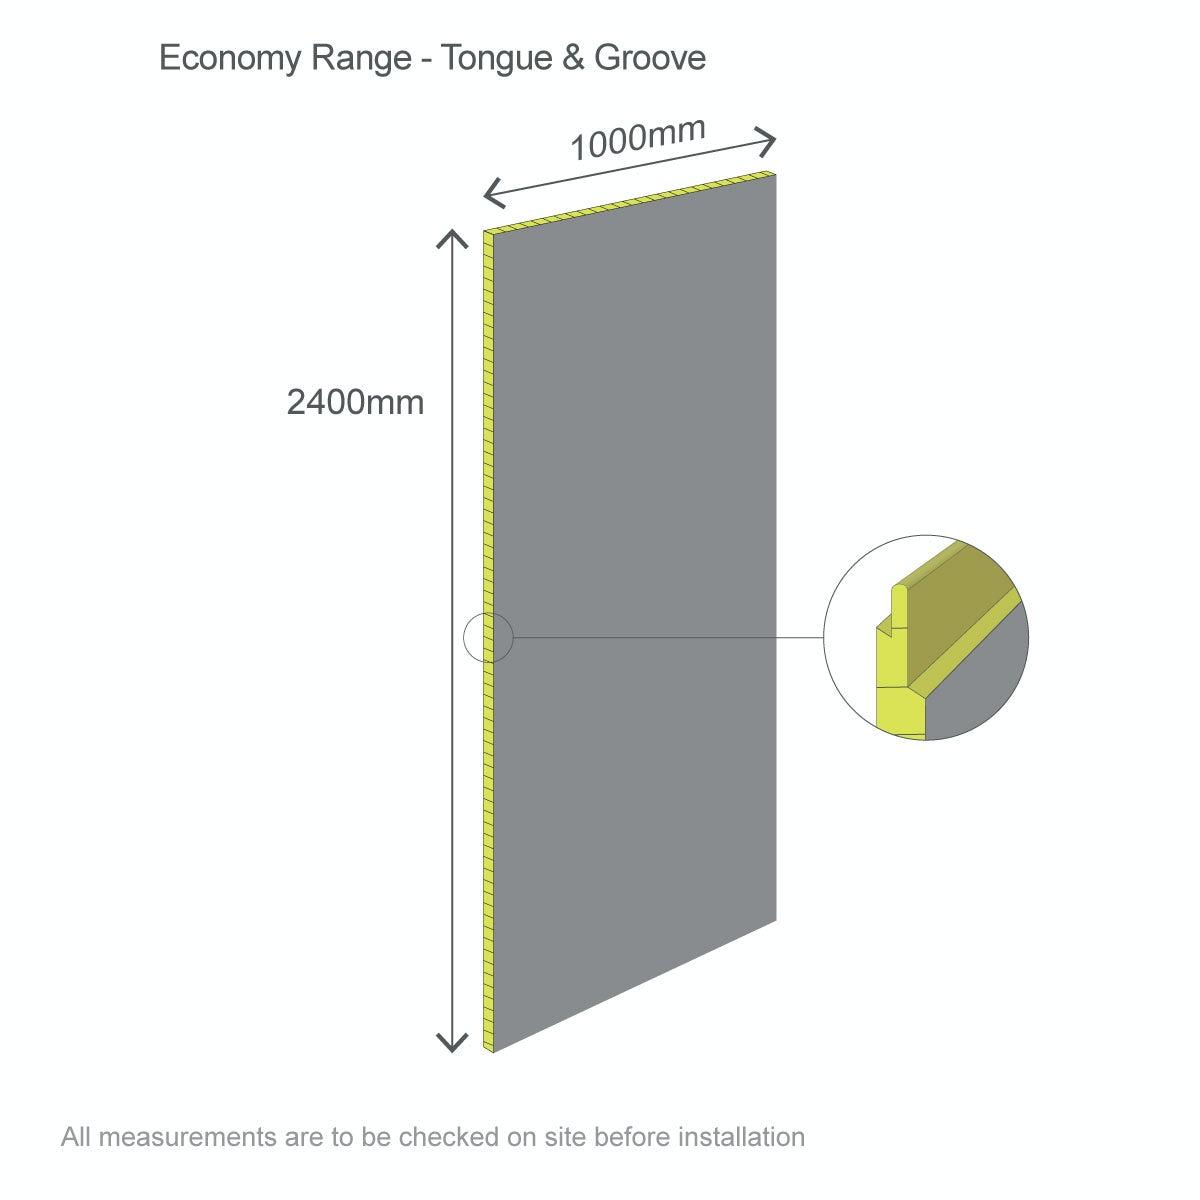 Dimensions for Multipanel Economy Sunlit Quartz shower wall single panel